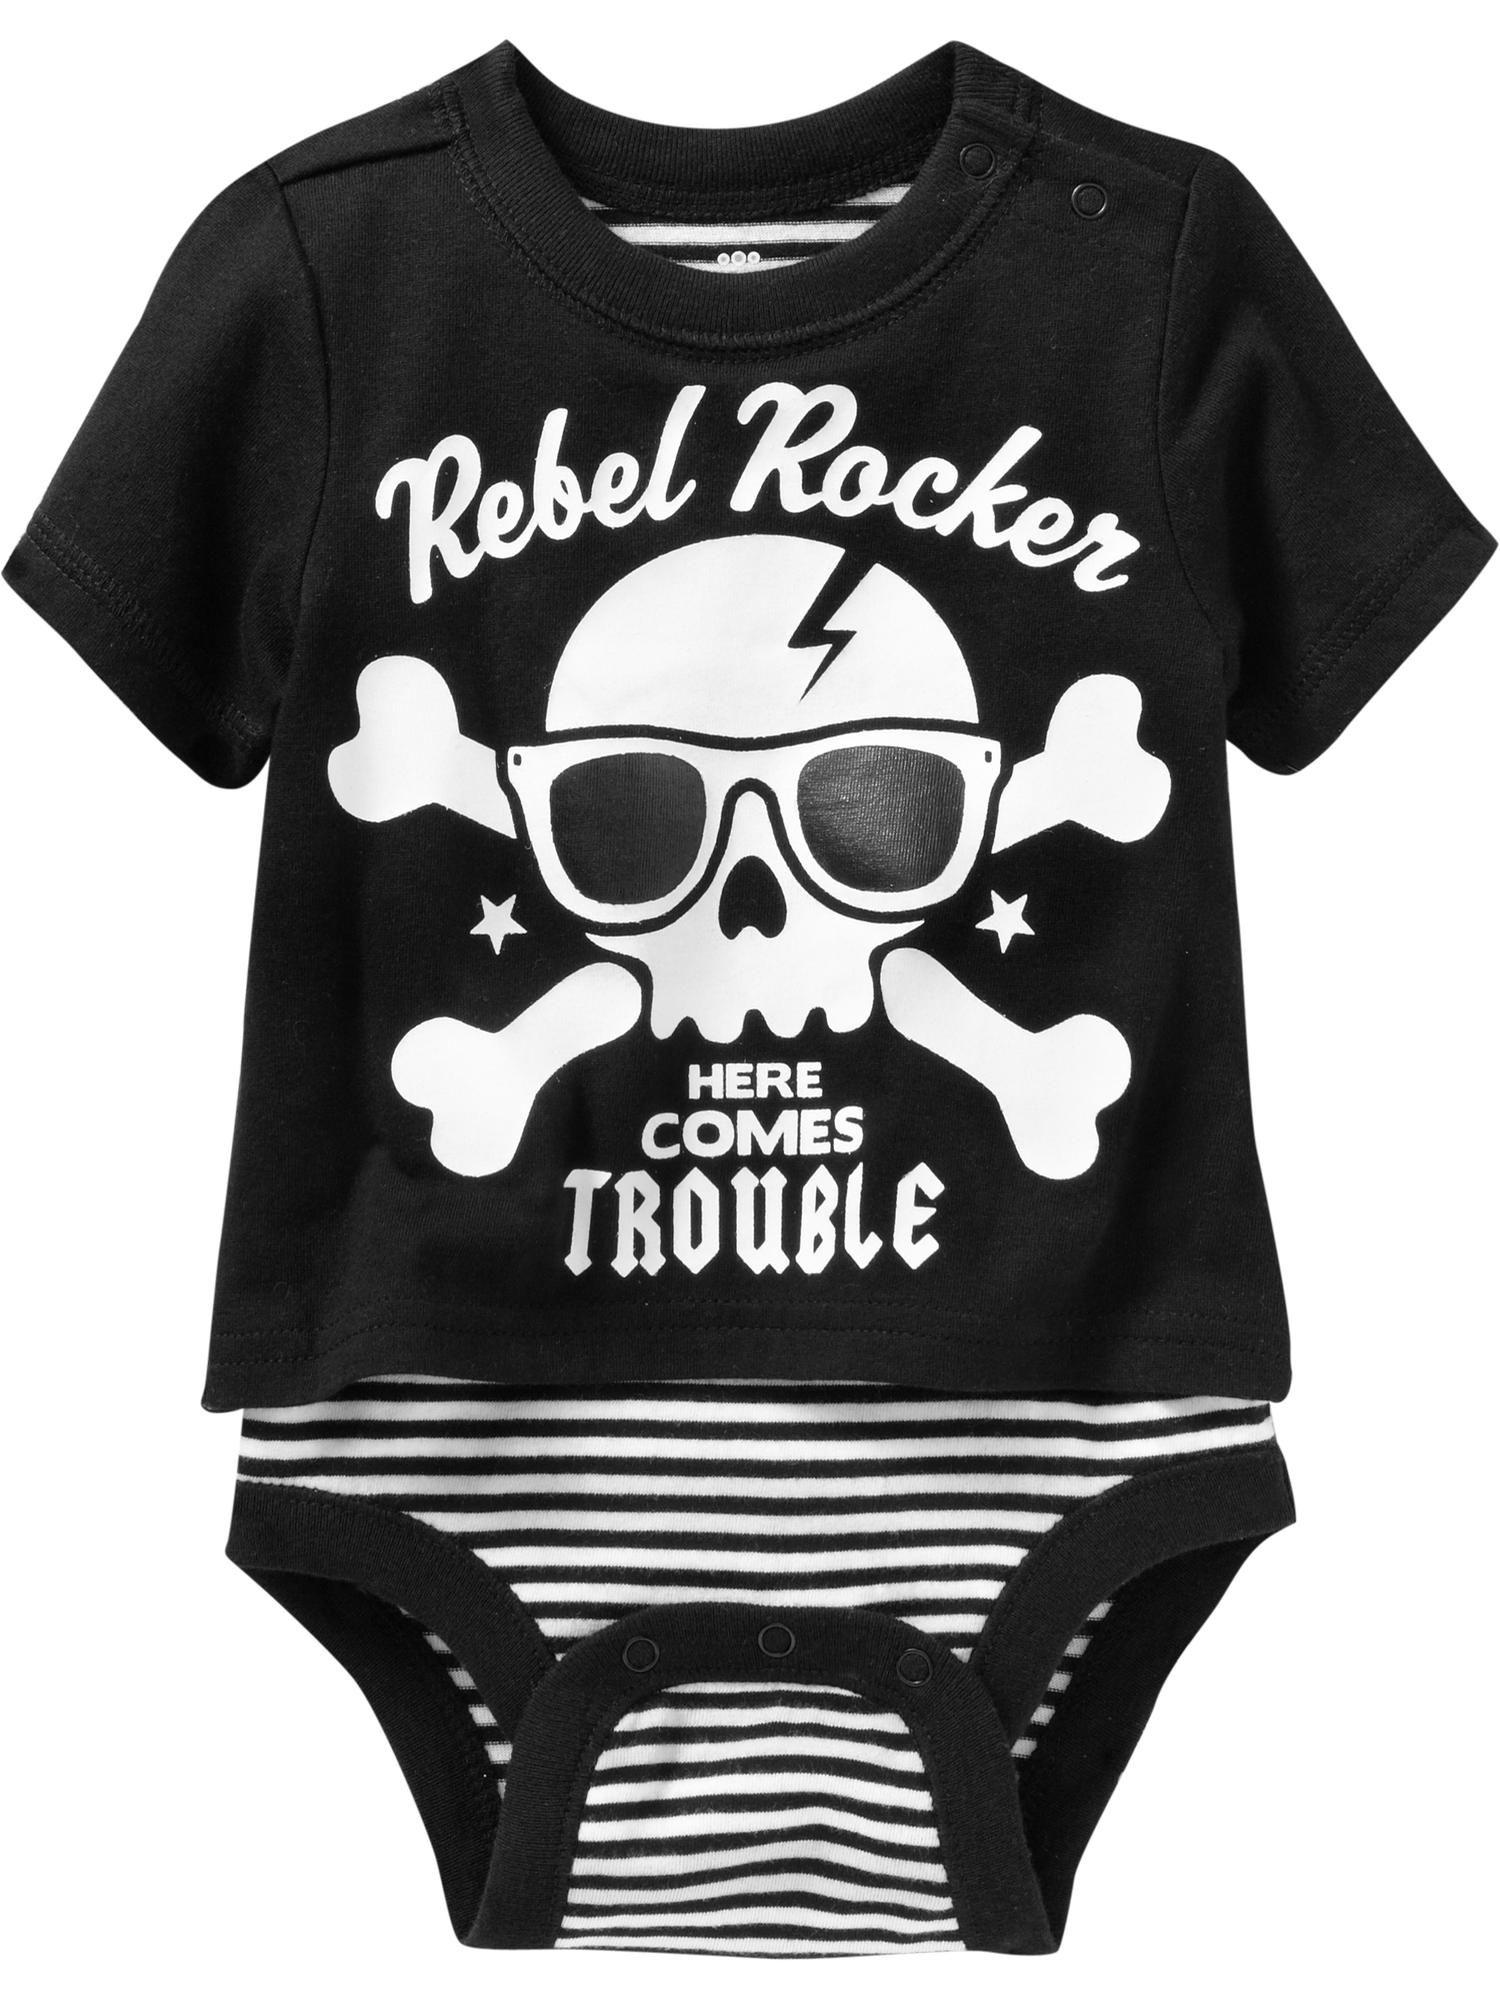 "Rebel Rocker"" Graphic Tee Bodysuits for Baby"